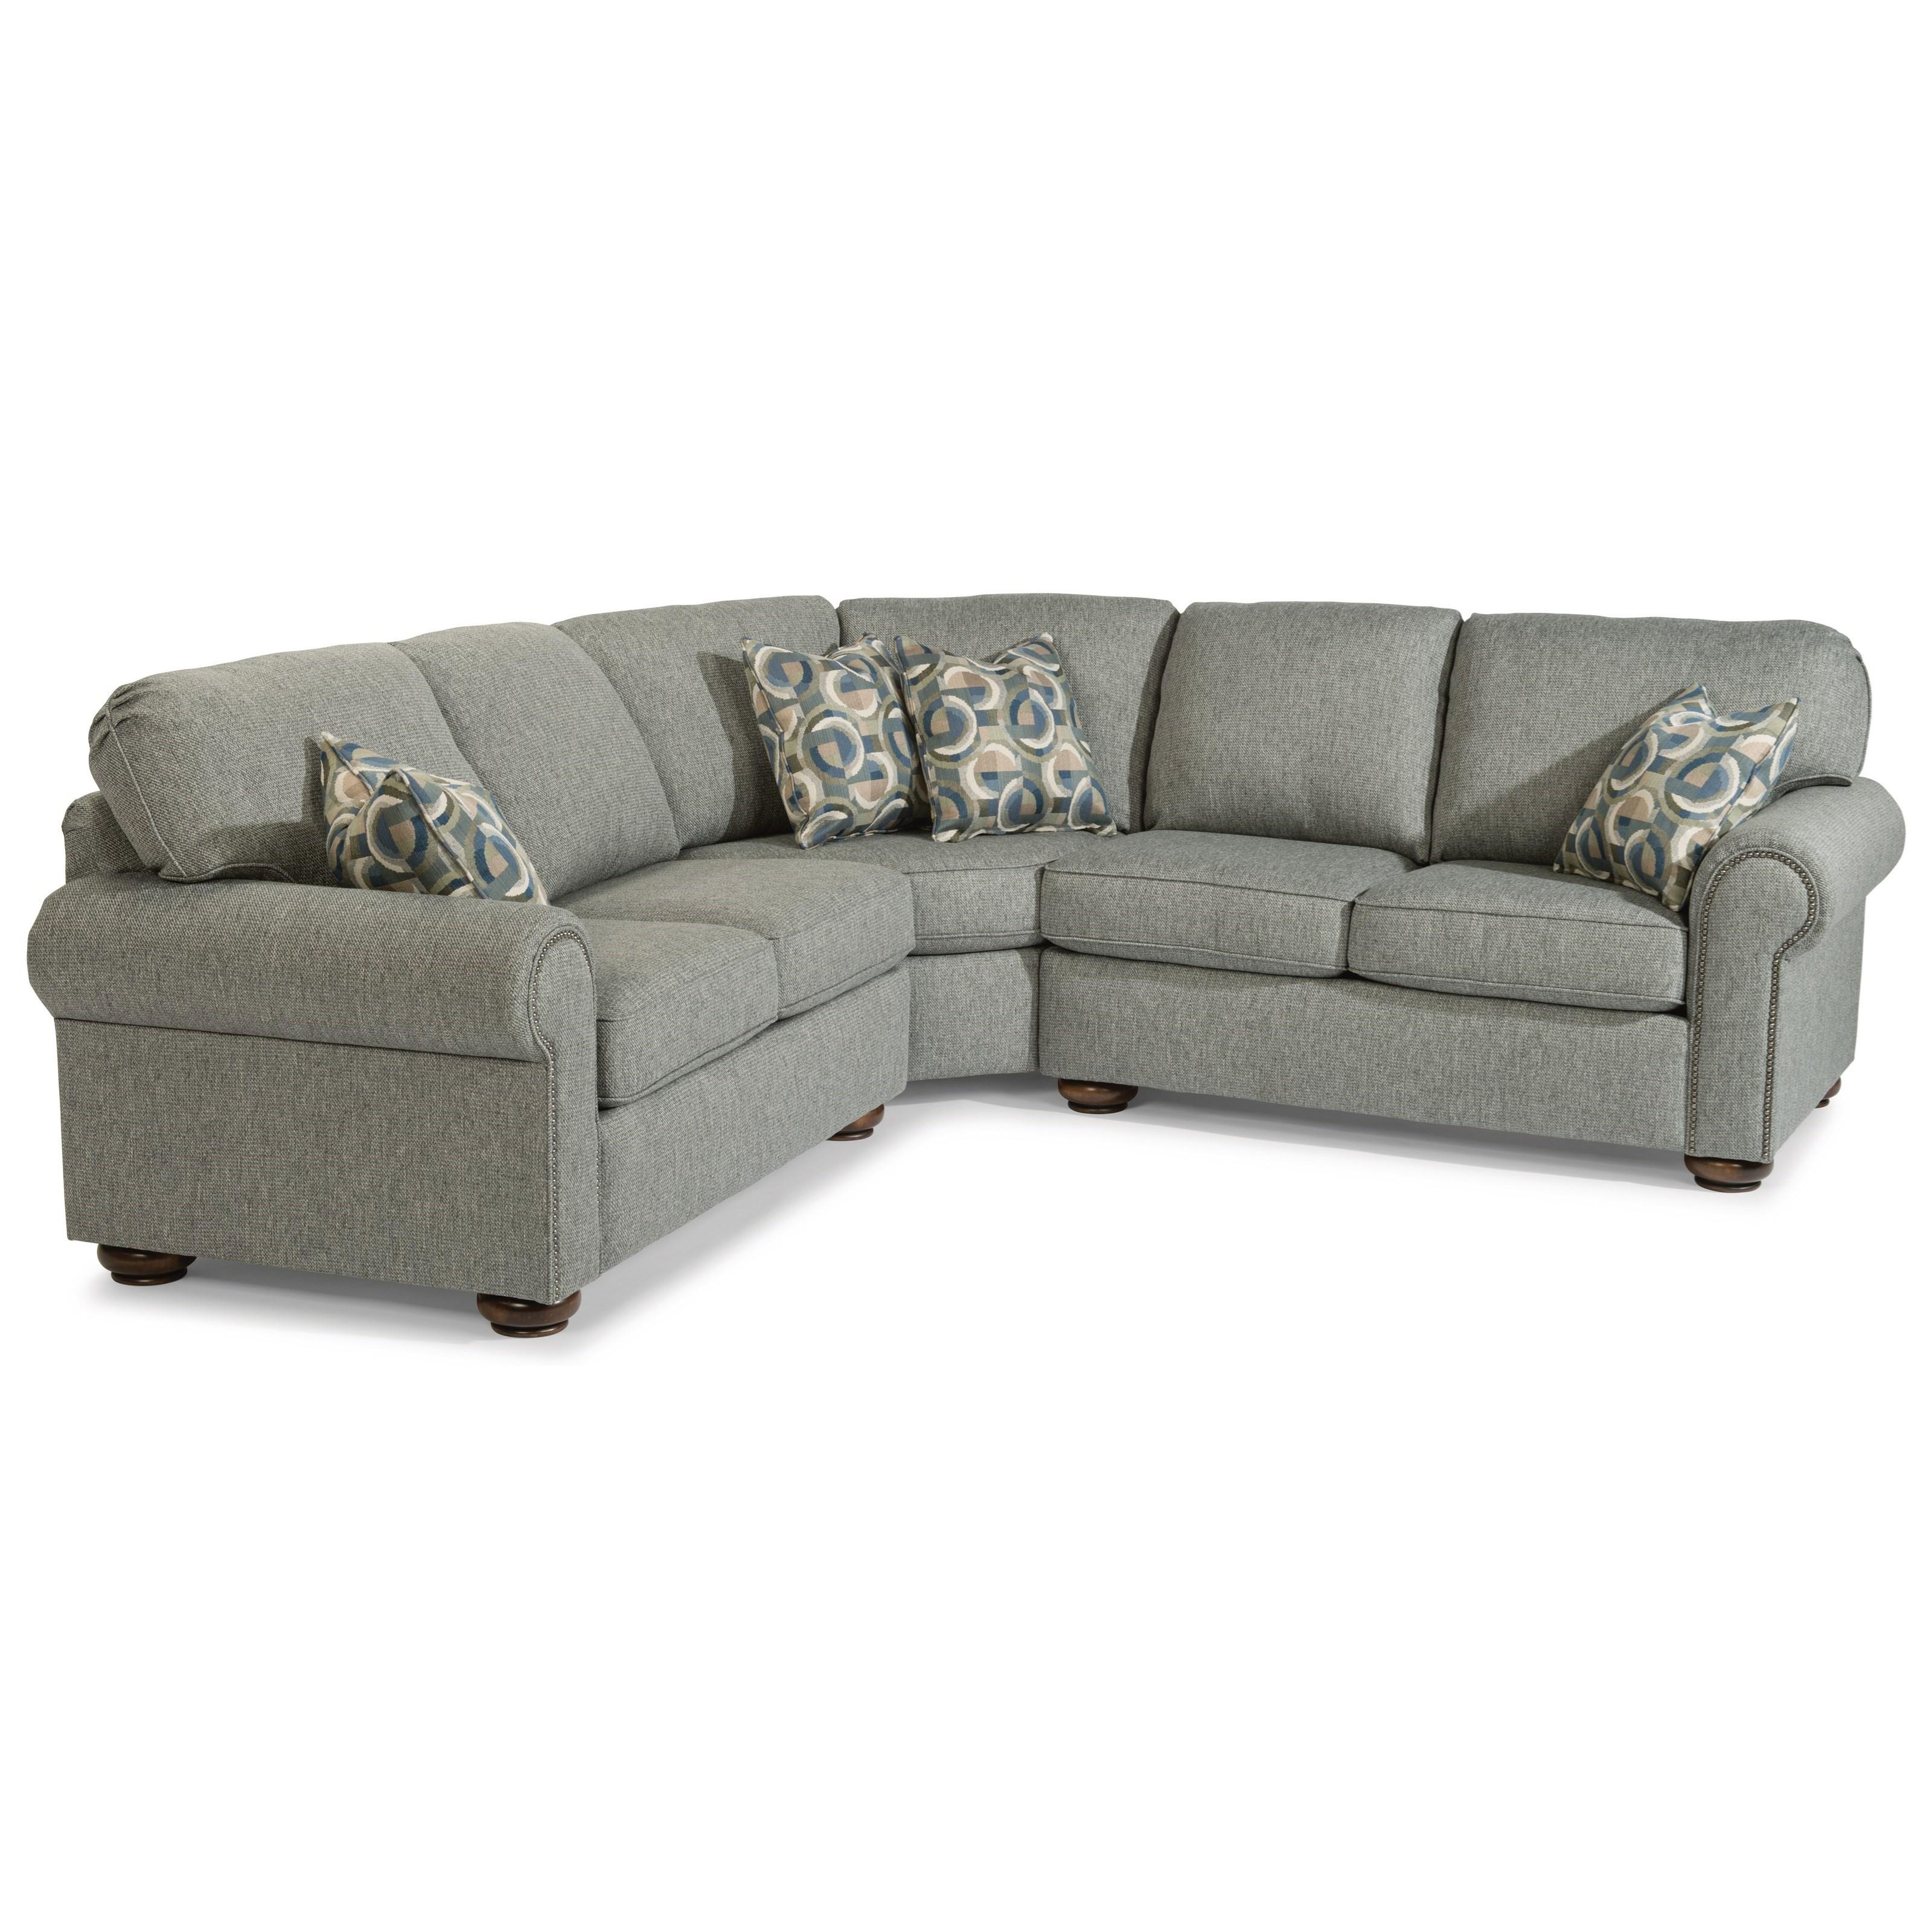 Merveilleux Flexsteel Preston Traditional 4 Seat Sectional Sofa With Nailhead Trim